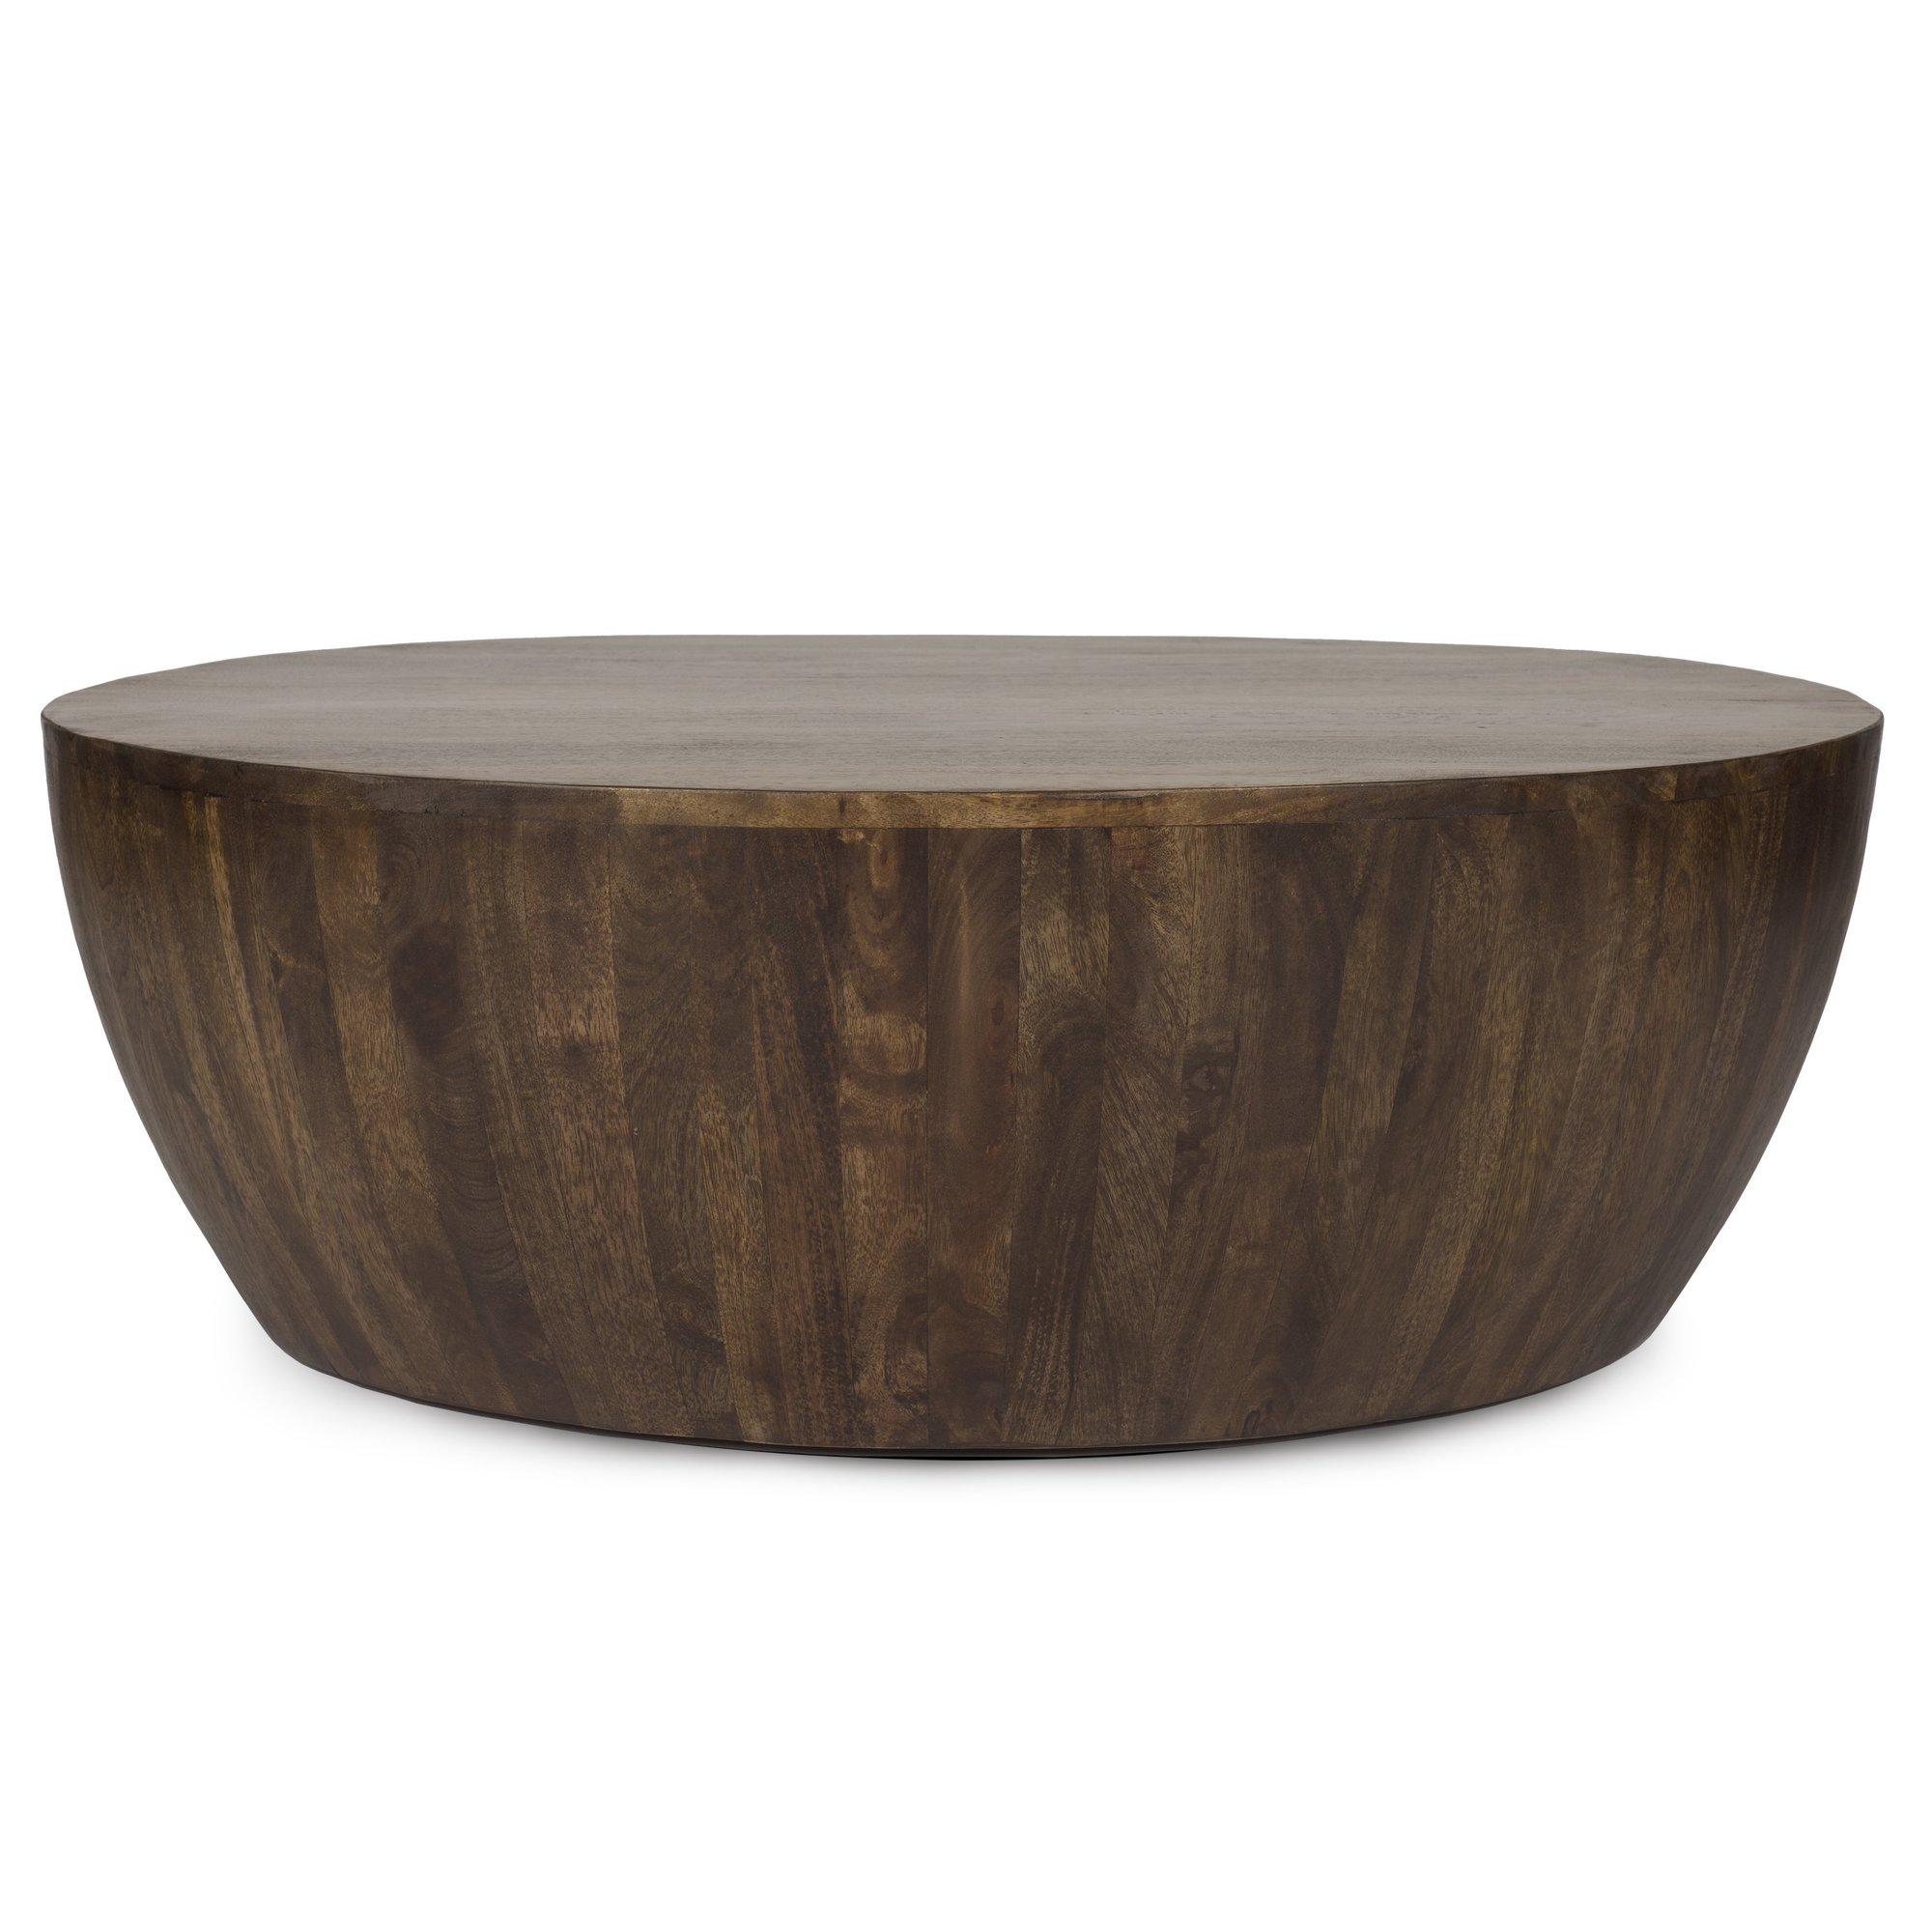 Goa Coffee Table - Walnut